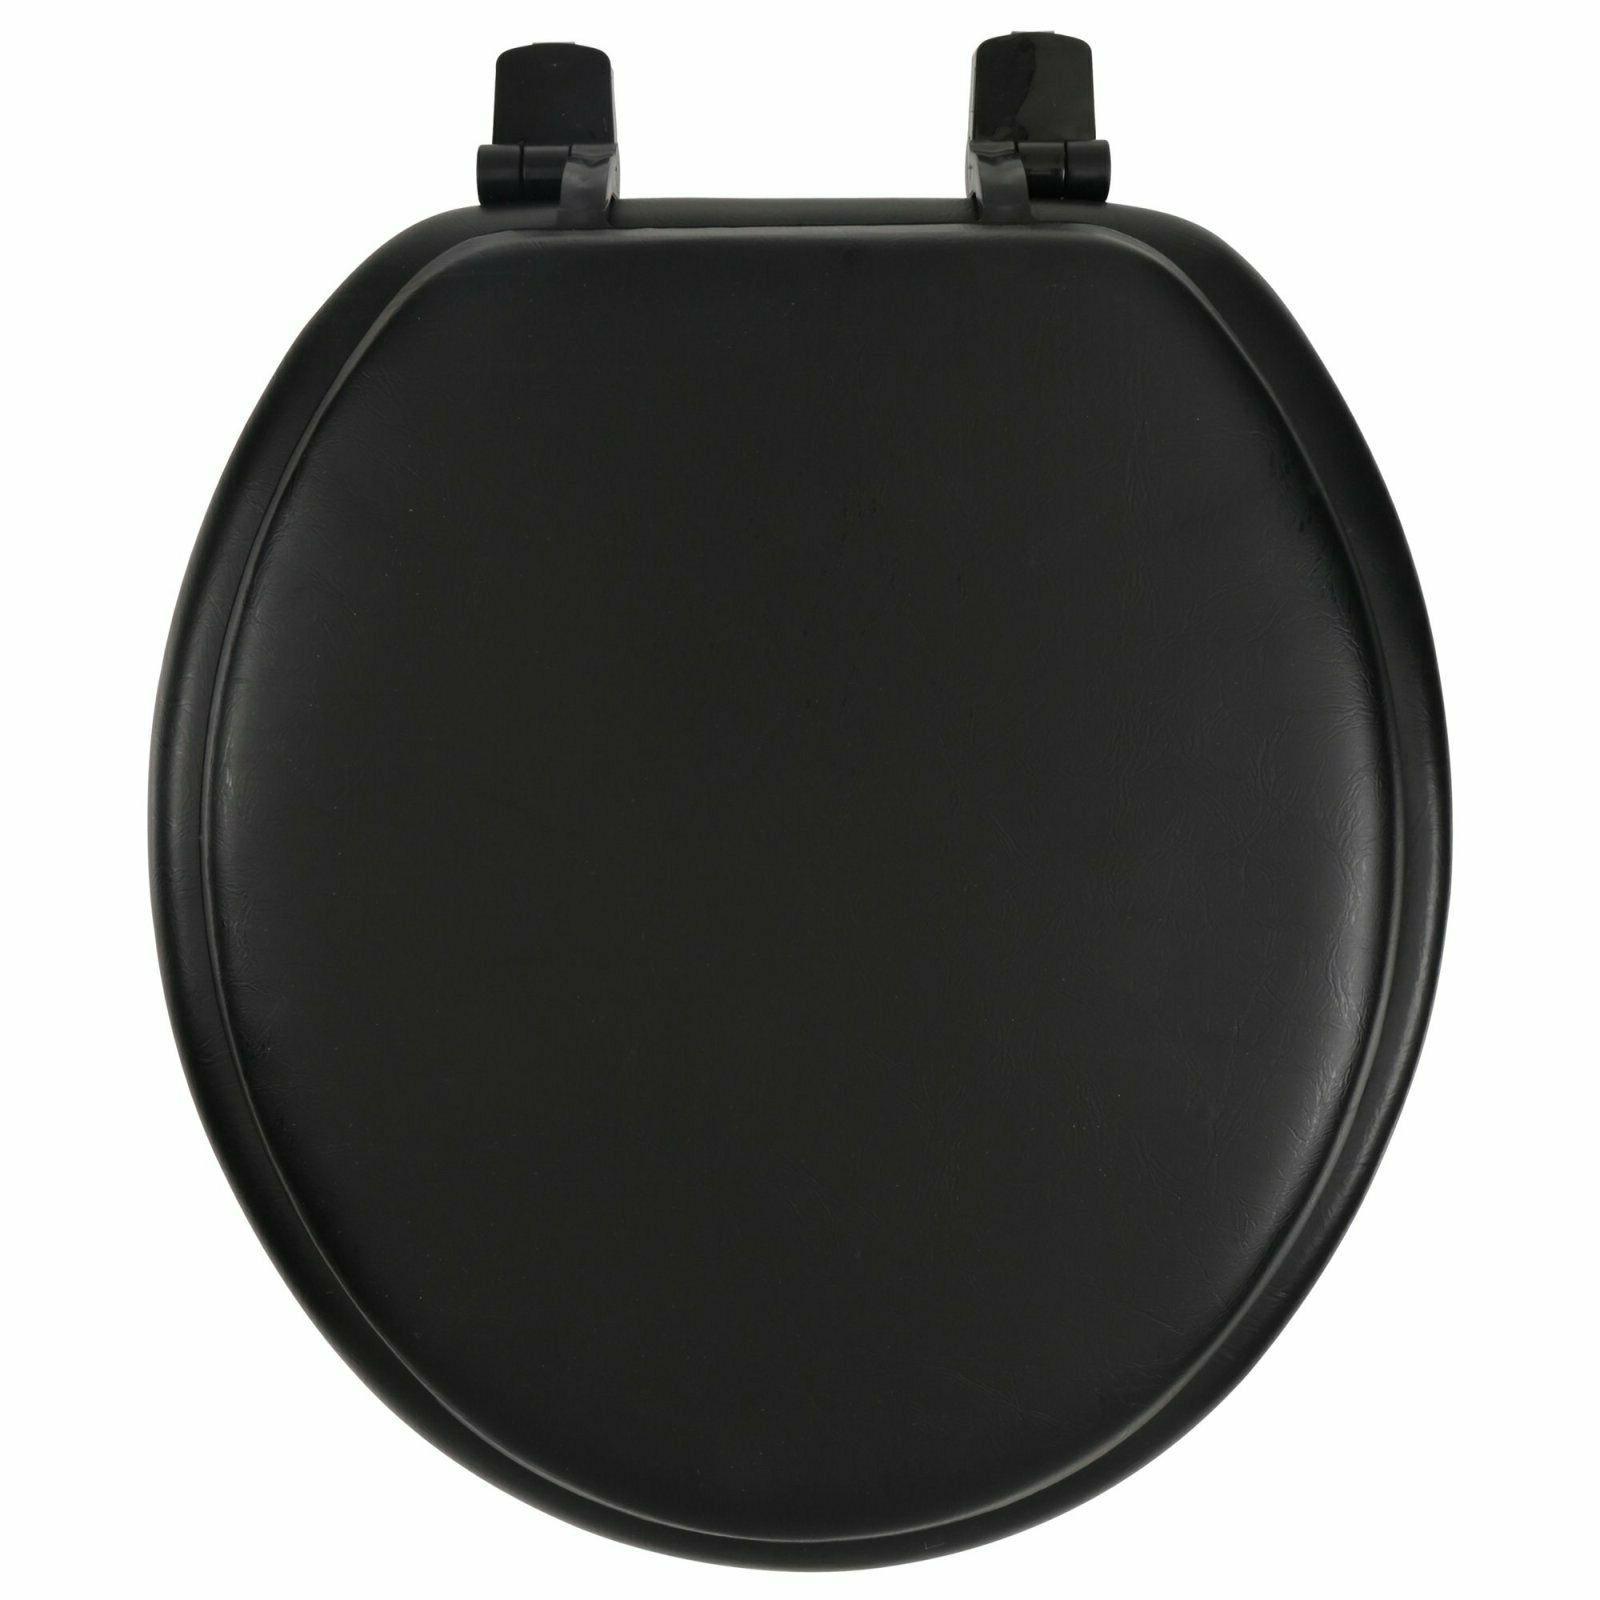 cushion soft padded toilet seat